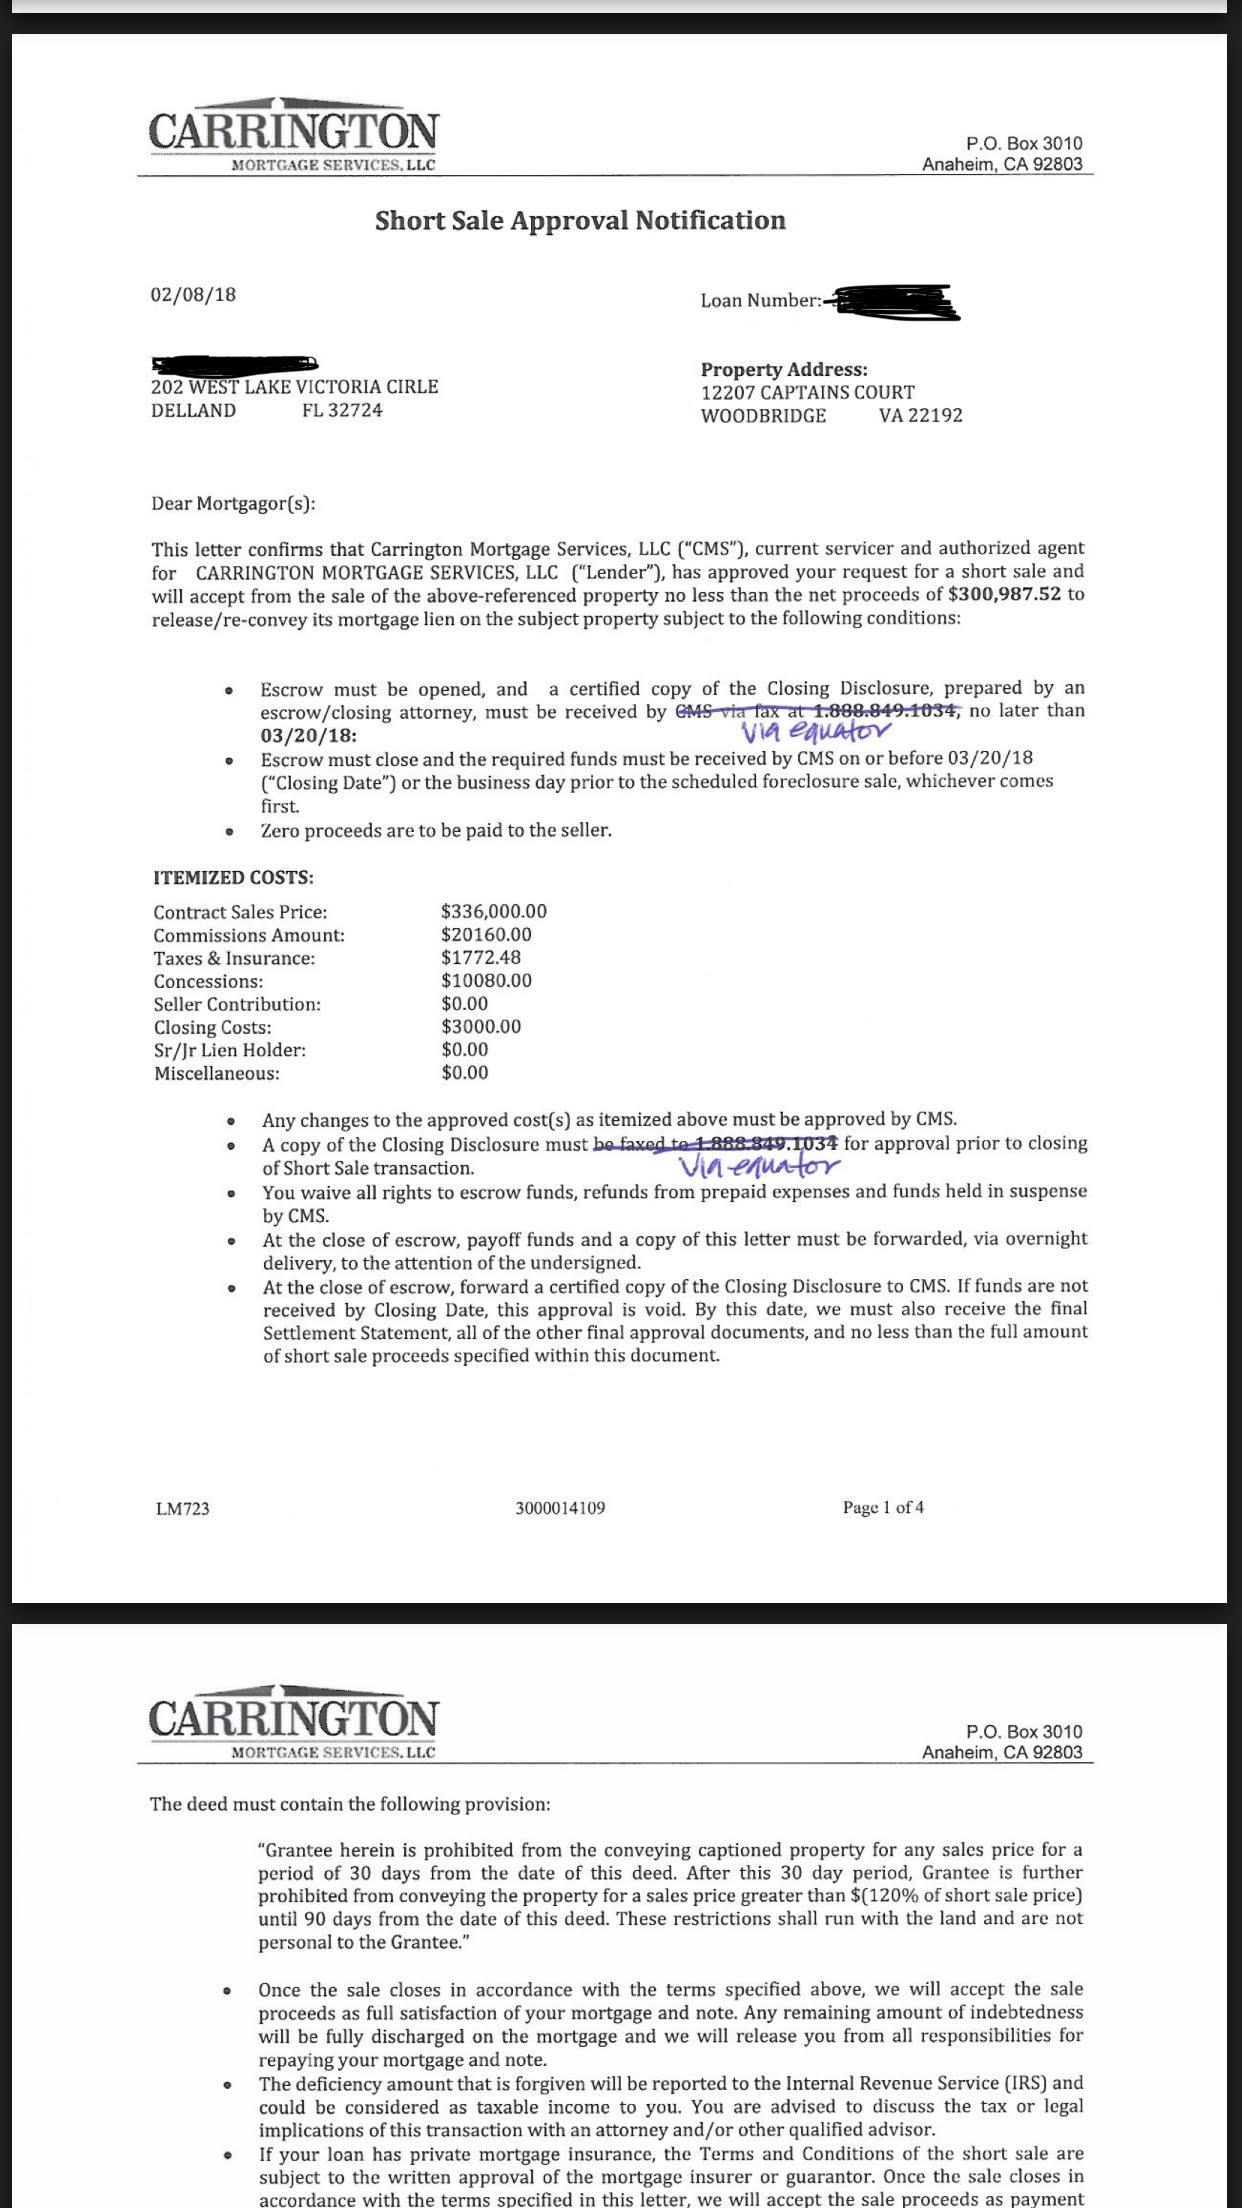 Charrington approval letter virginia short sale specialist top for Short sale marketing letter